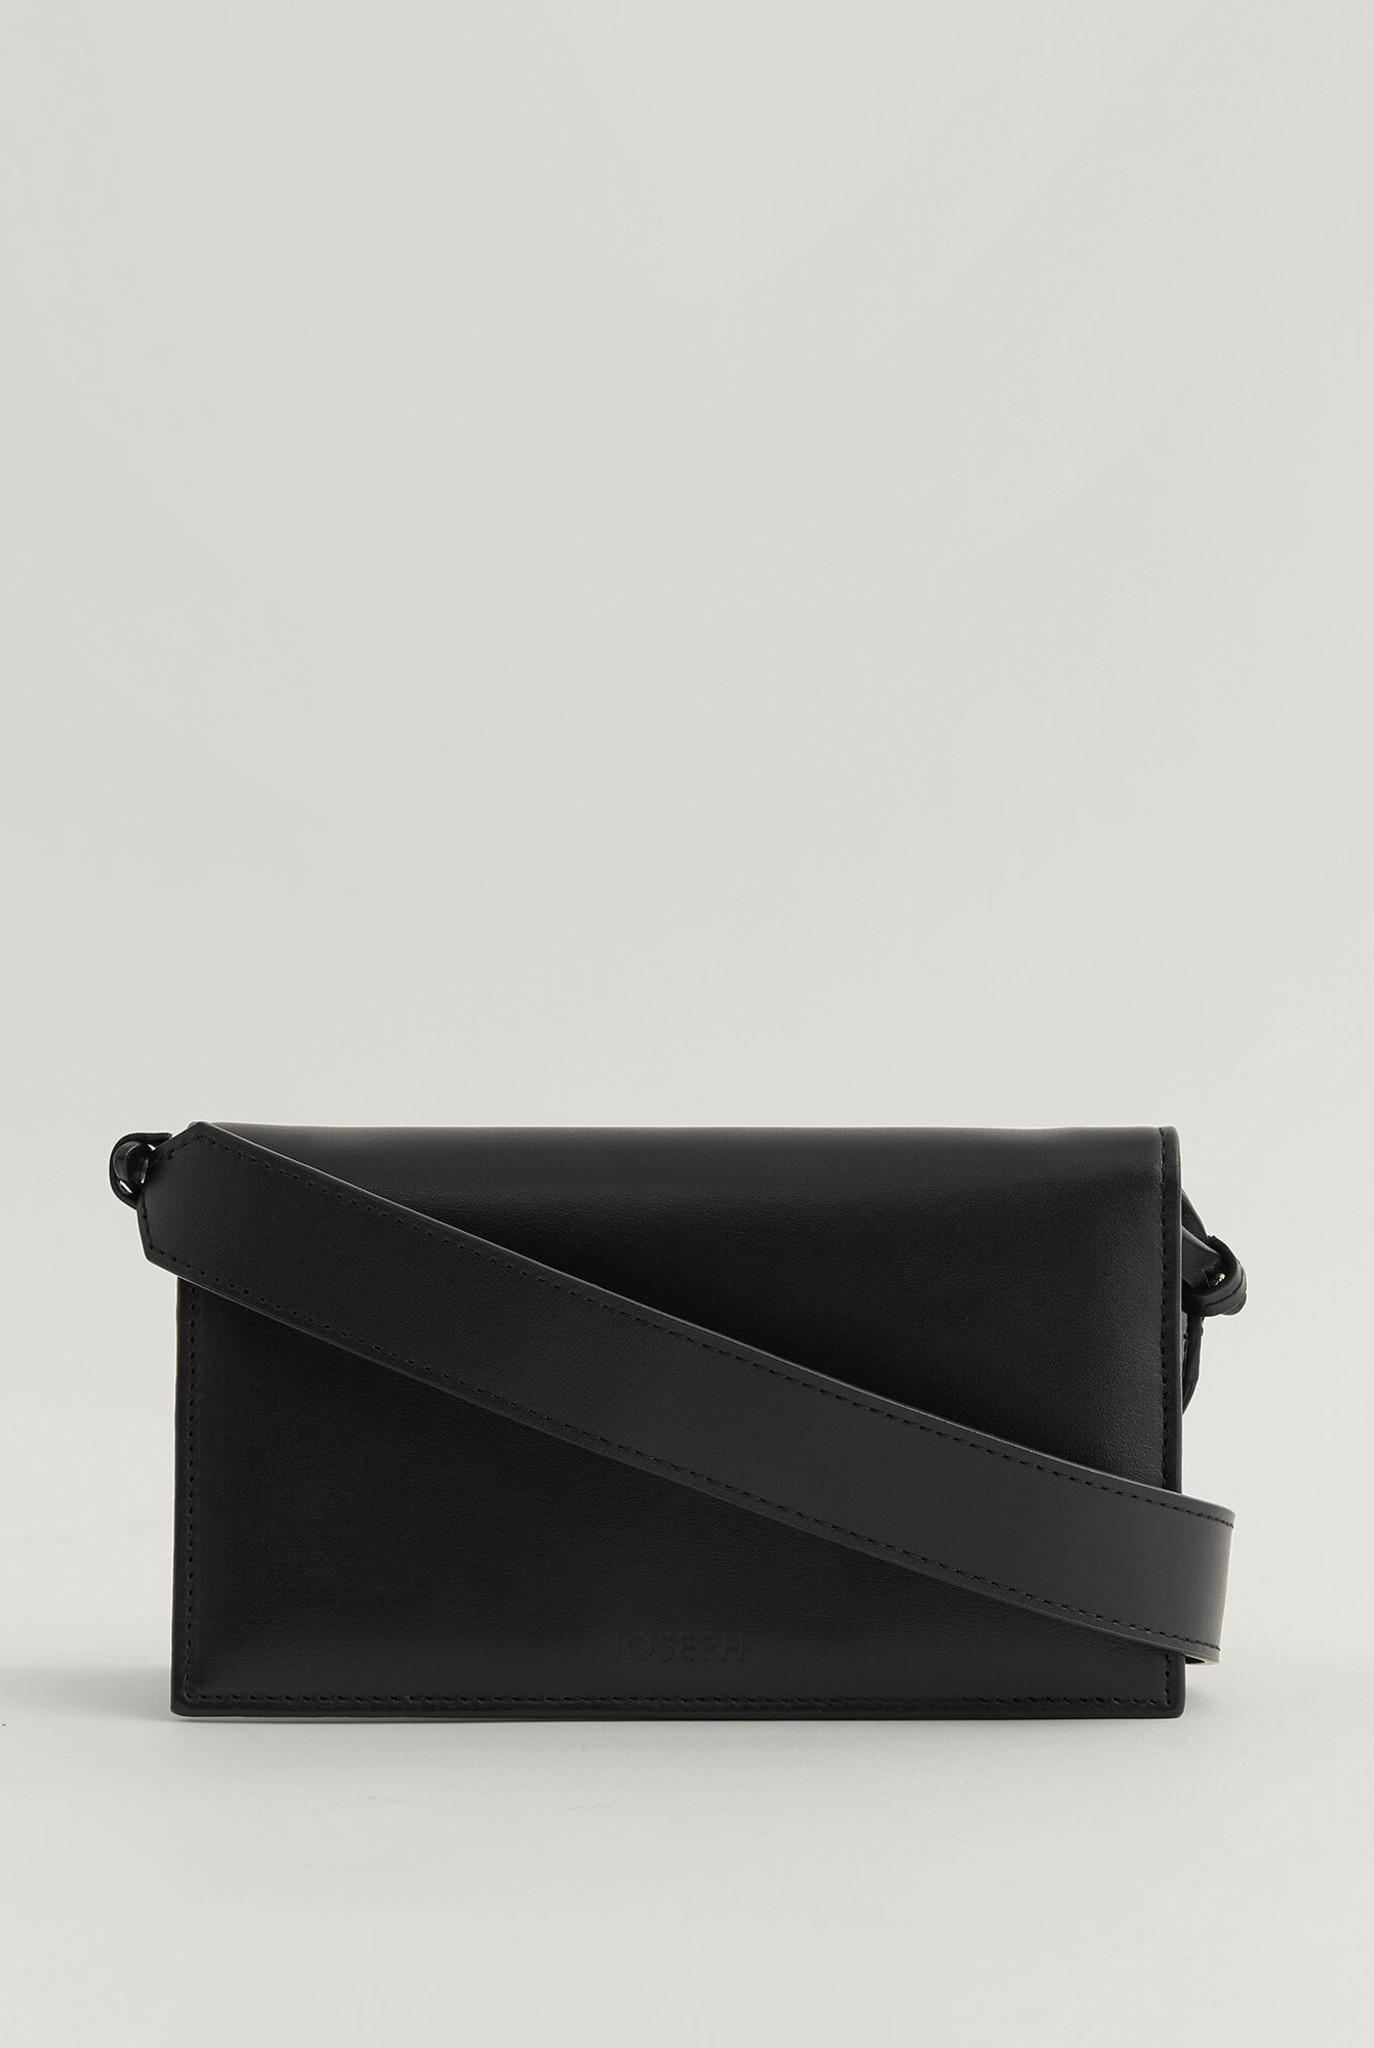 PM1 Bag Black